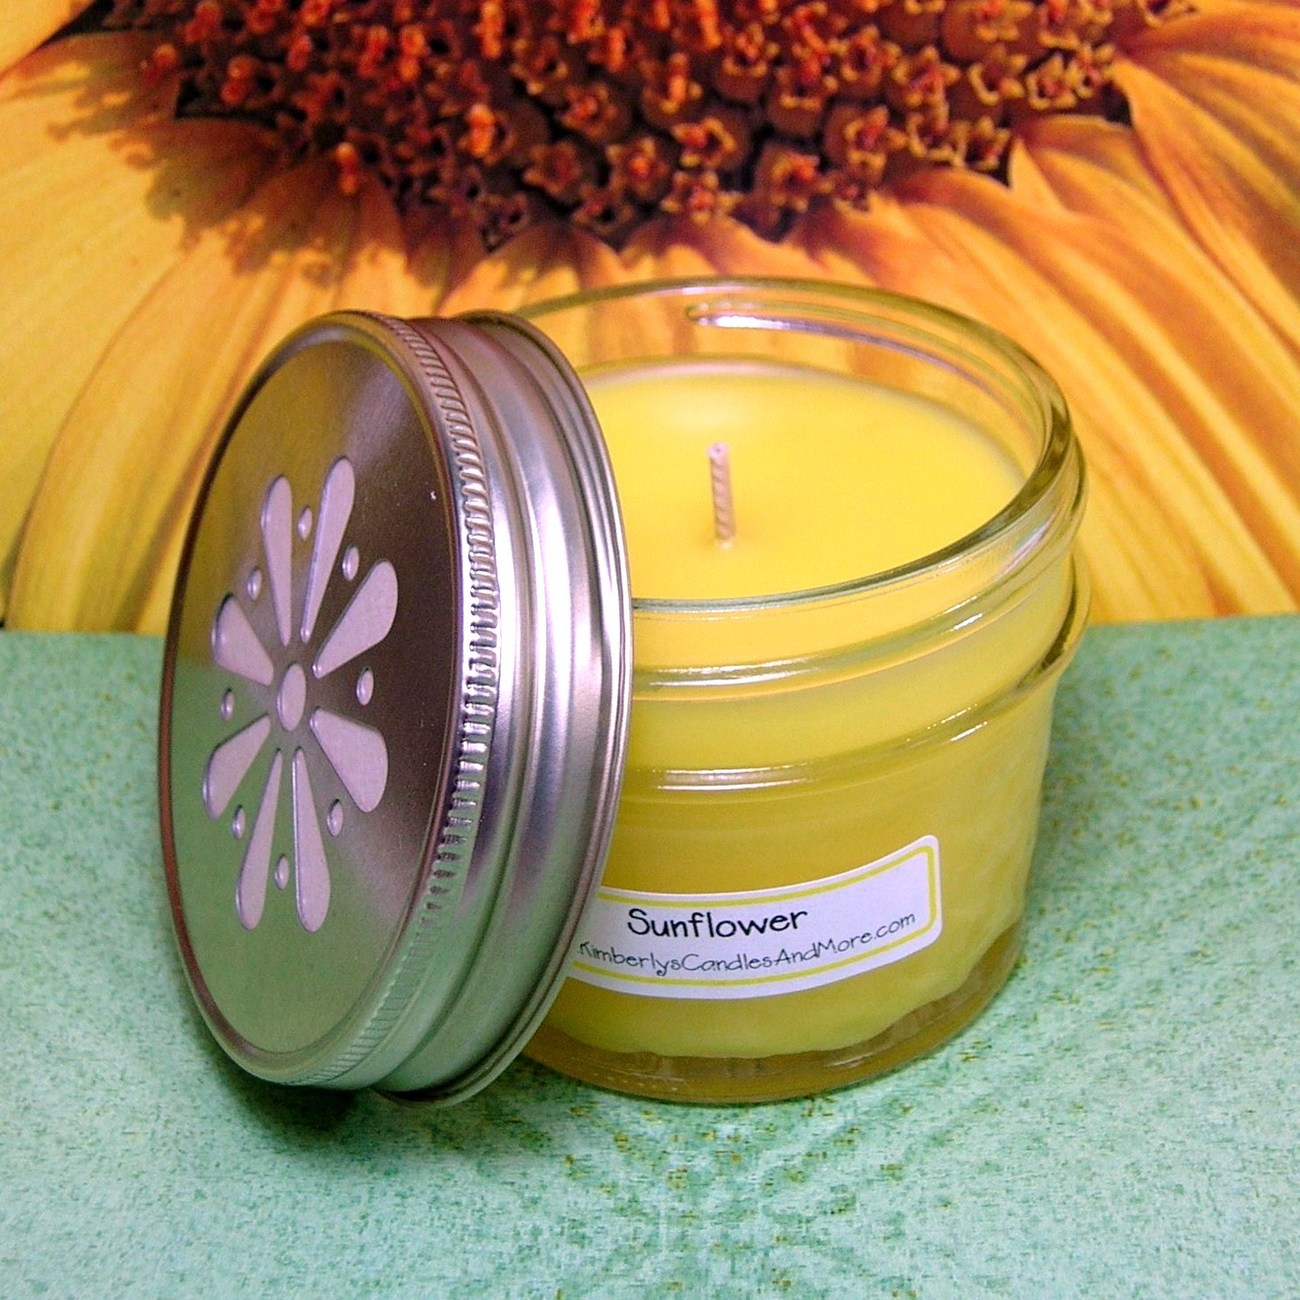 Sunflower 4 oz. Jelly Jar Candle